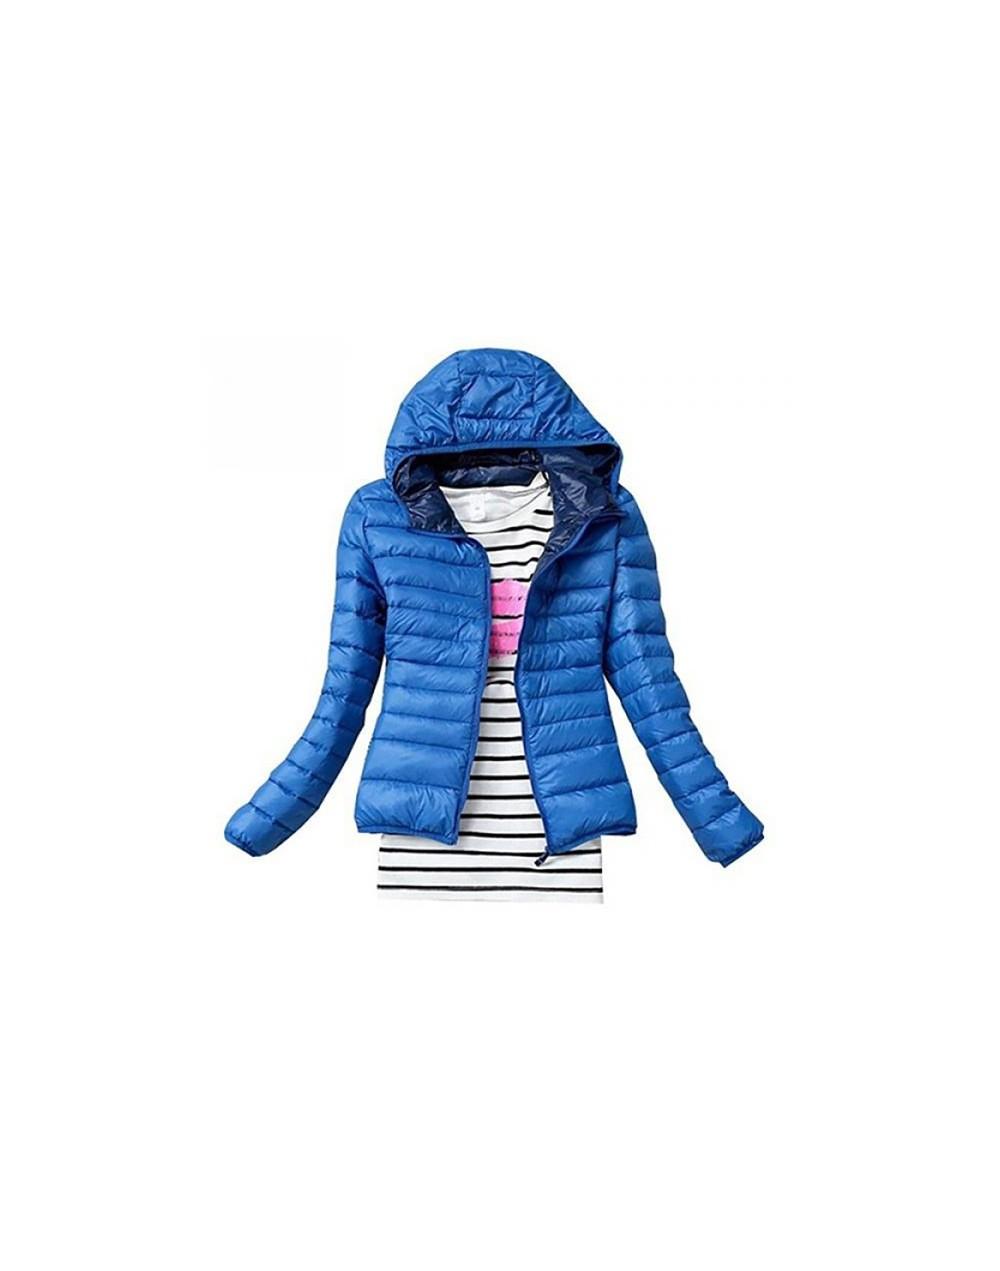 Fashion Women's Winter Short Jacket Coats Female Warm Parka Slim Cotton Padded Lining Sports Overcoat Casual Outwear Size XS...